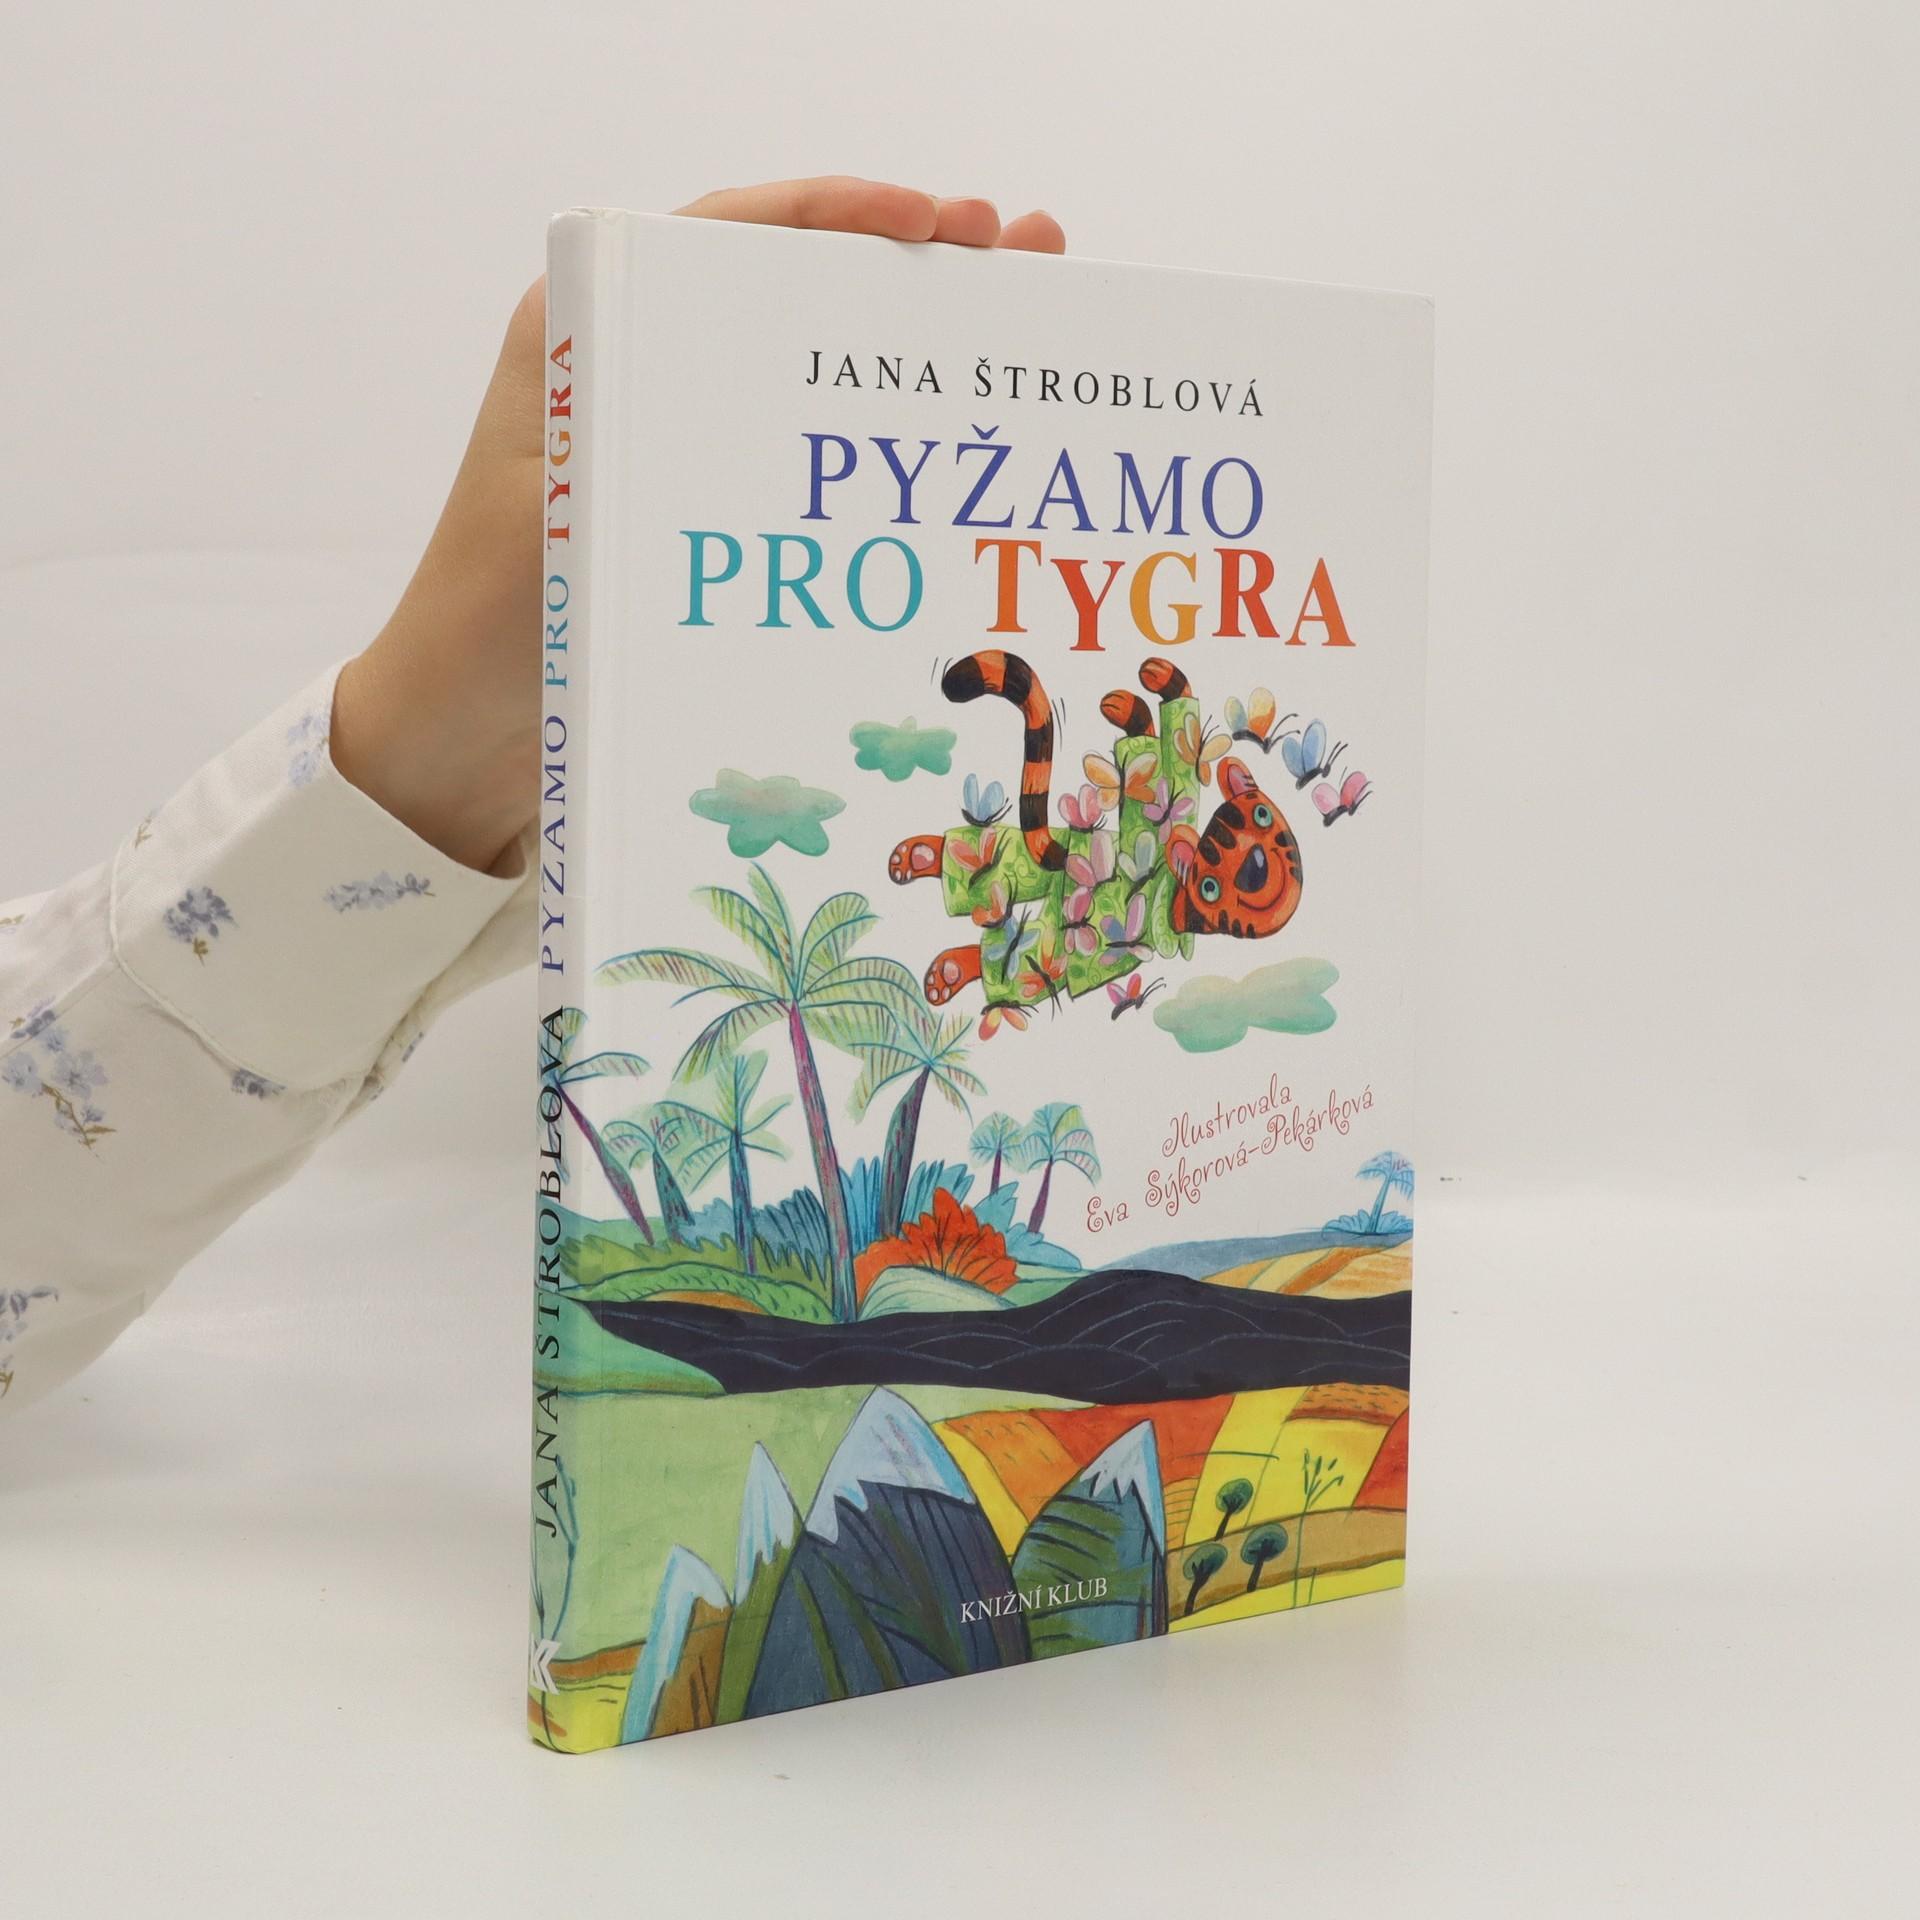 antikvární kniha Pyžamo pro tygra, 2011